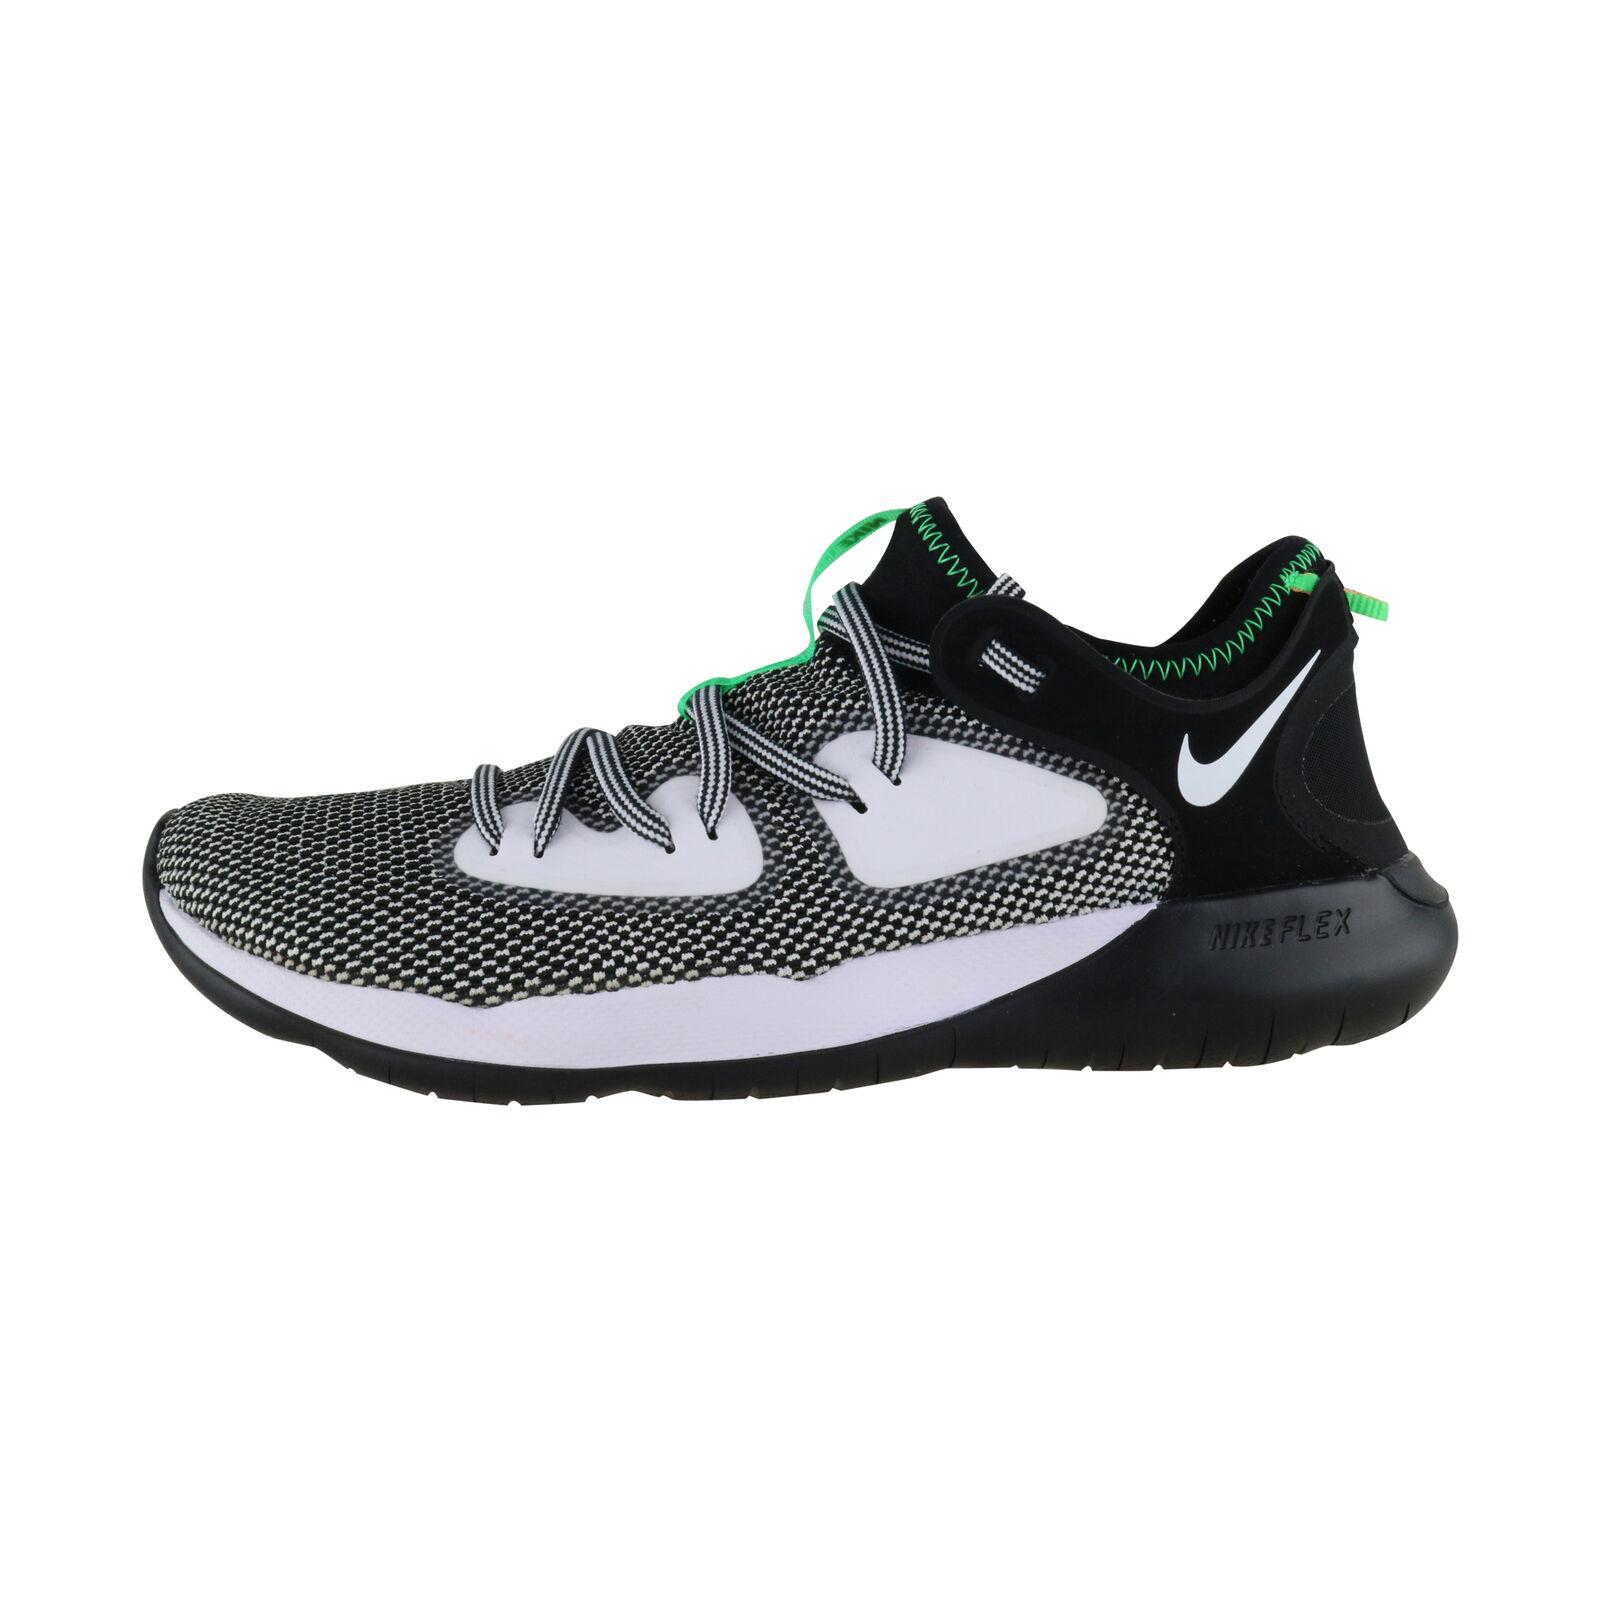 Nike Flex 2019 rn se negro blancoo bq9256-100